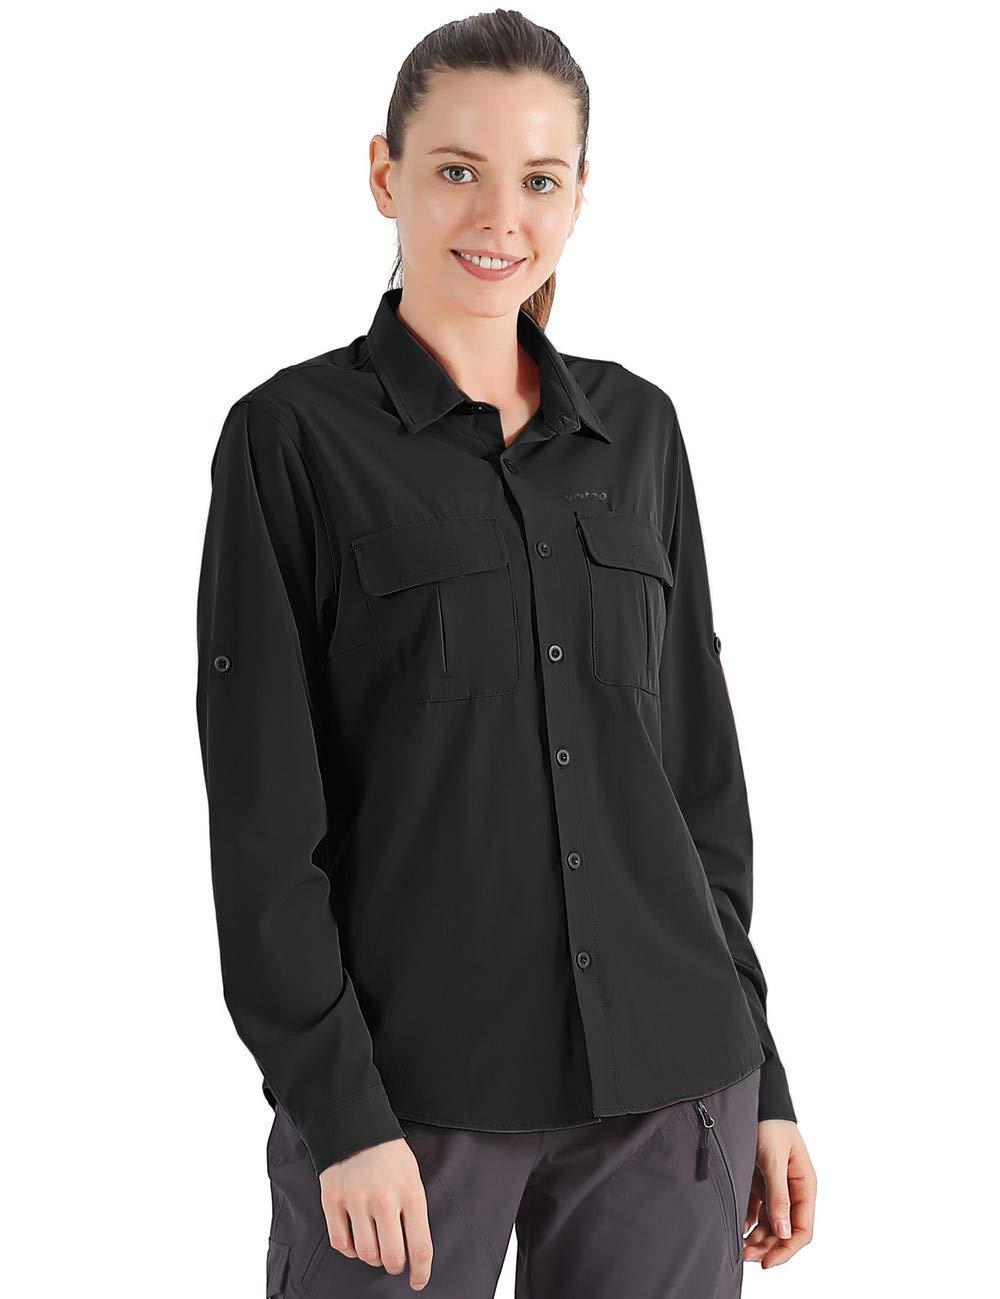 Unitop Women's Roll-Up Long Sleeve Fishing Shirt for Hiking Camping